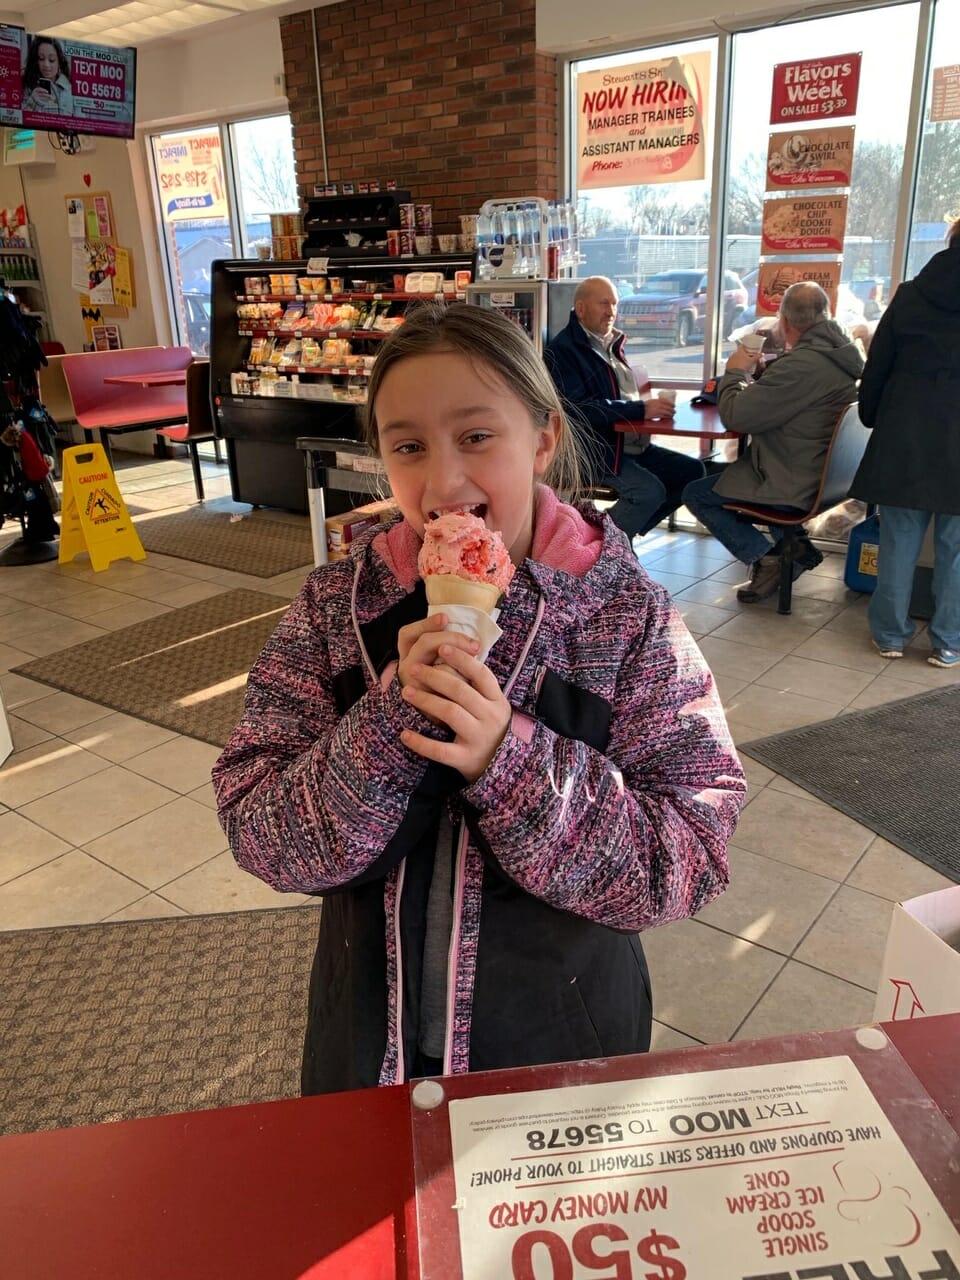 A young girl having an ice cream cone